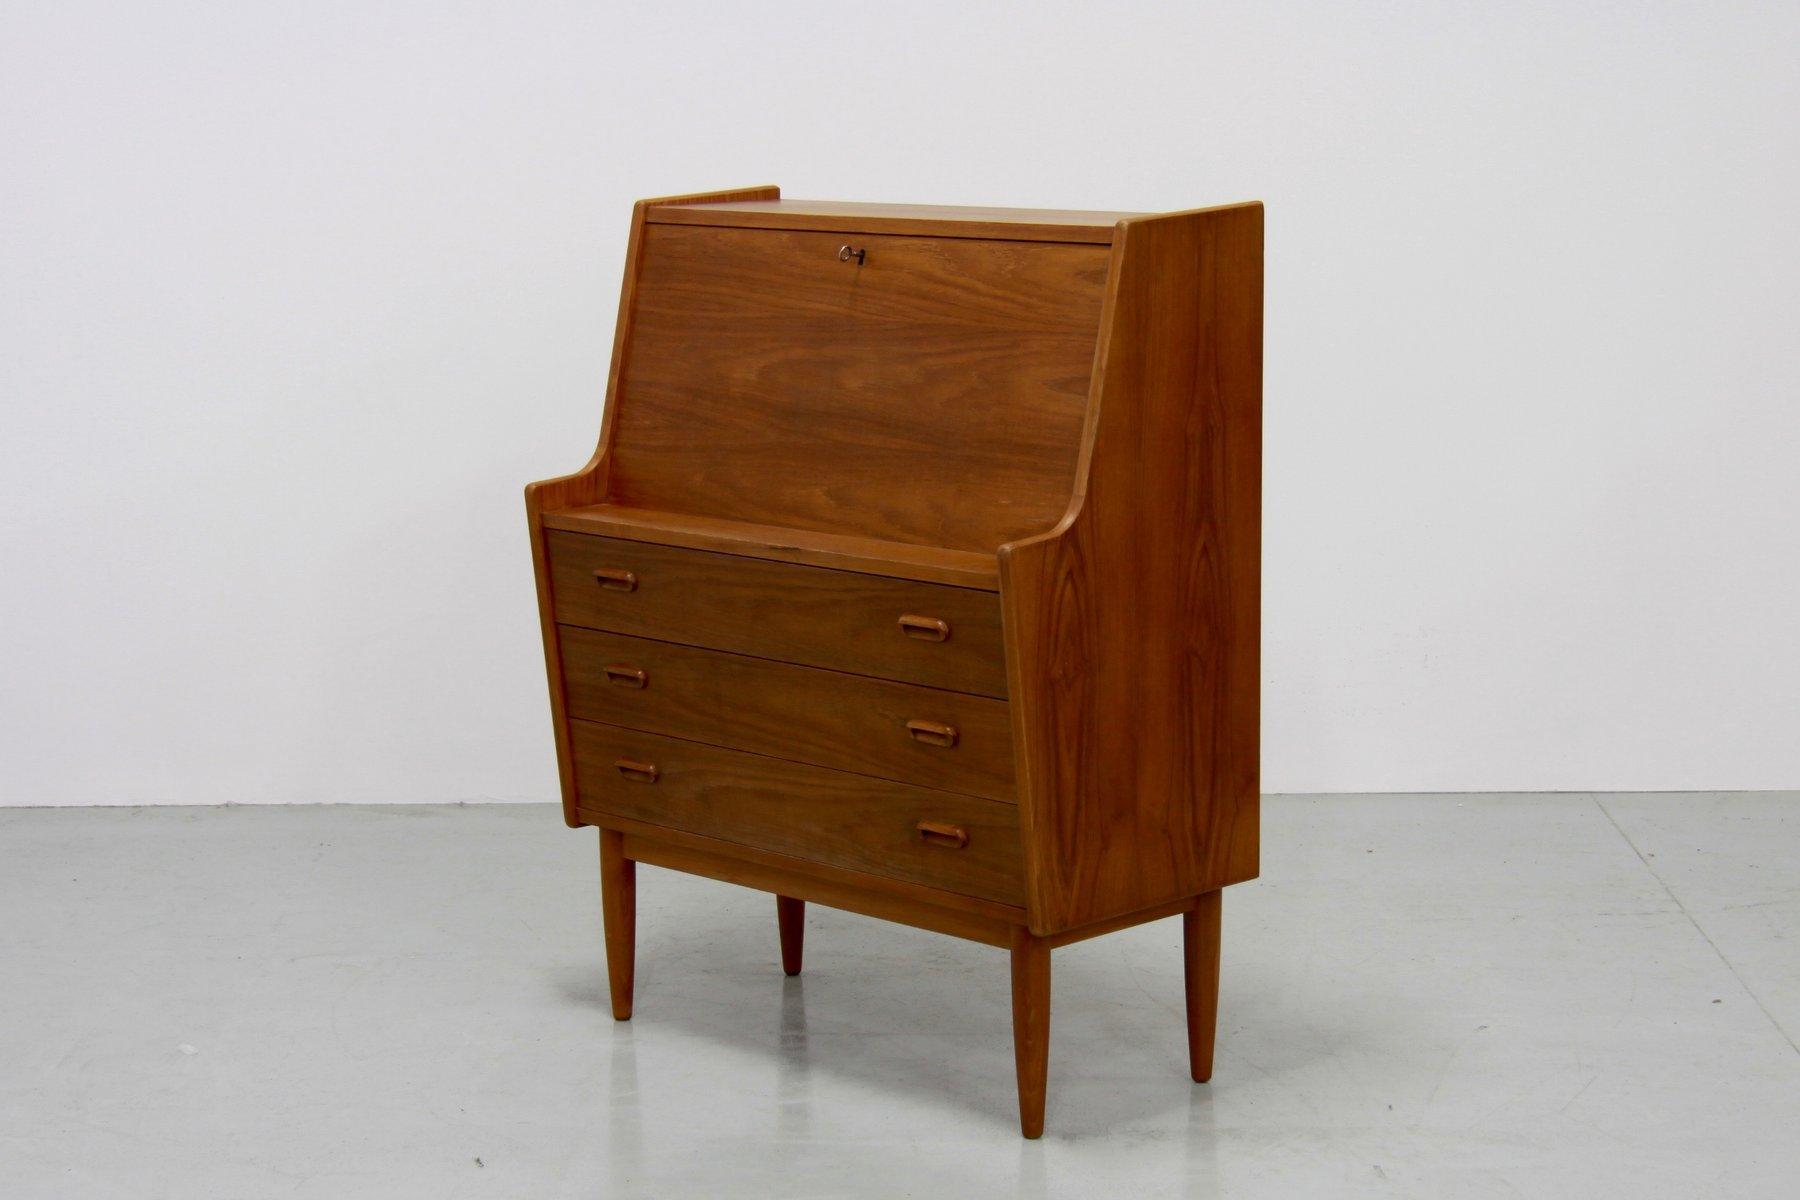 d nisches teak furnier sekret r von falster 1970er bei. Black Bedroom Furniture Sets. Home Design Ideas